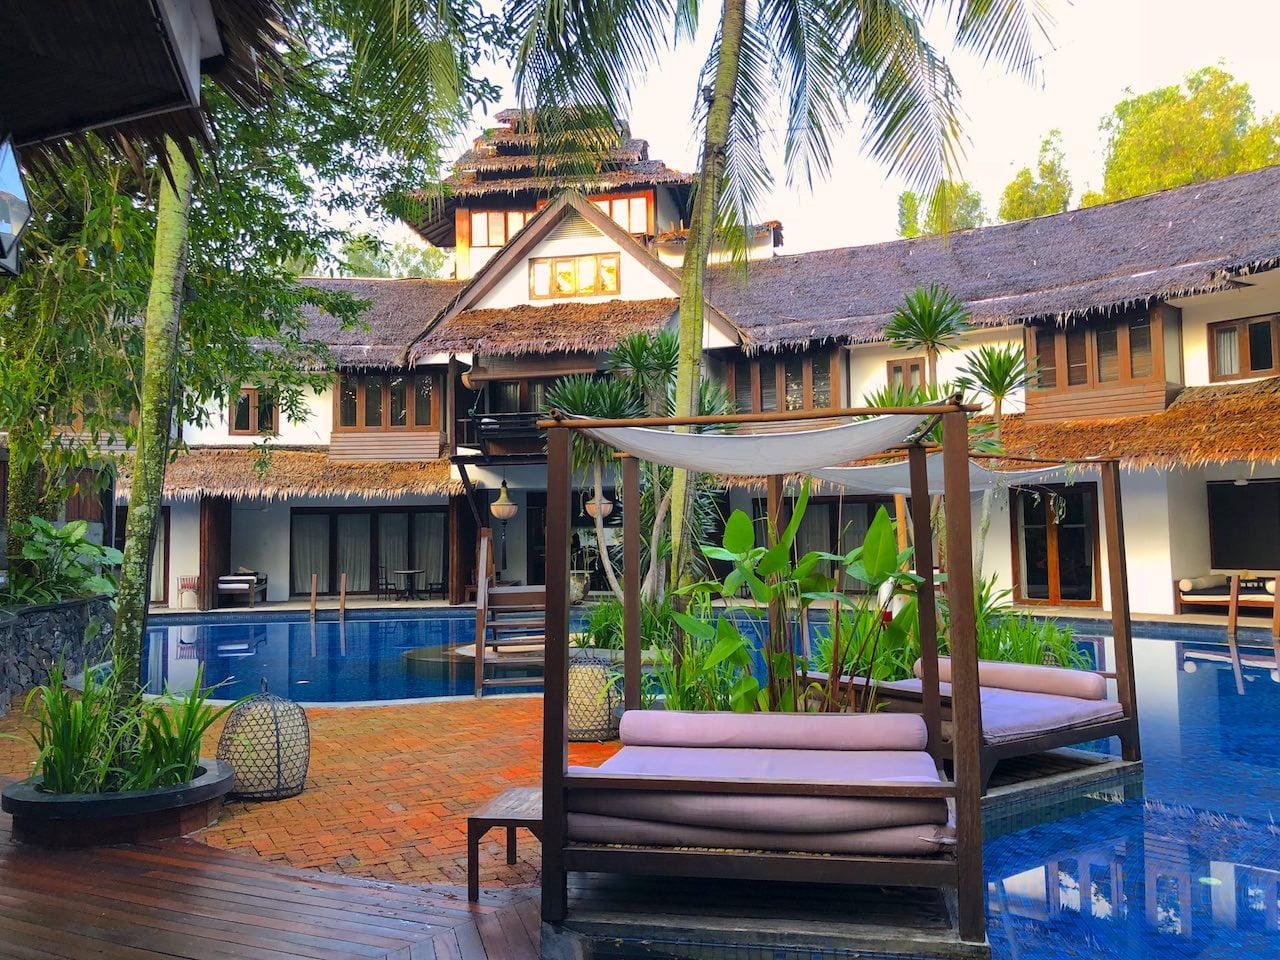 Malaysis hosetel villasamadhi 0067